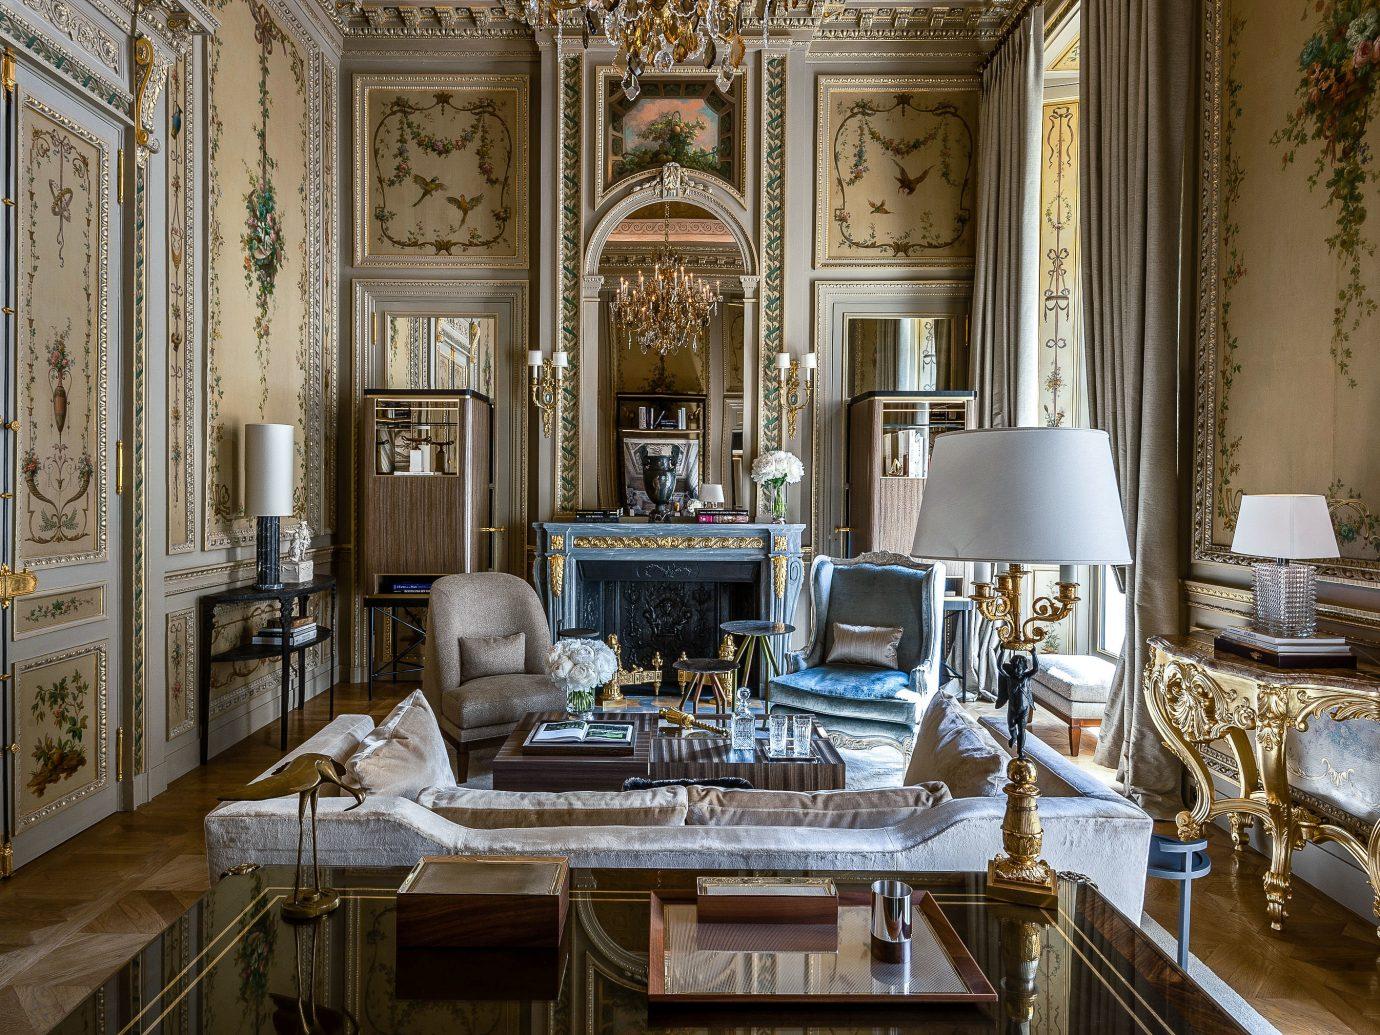 Boutique Hotels Hotels Luxury Travel indoor interior design furniture living room home estate window